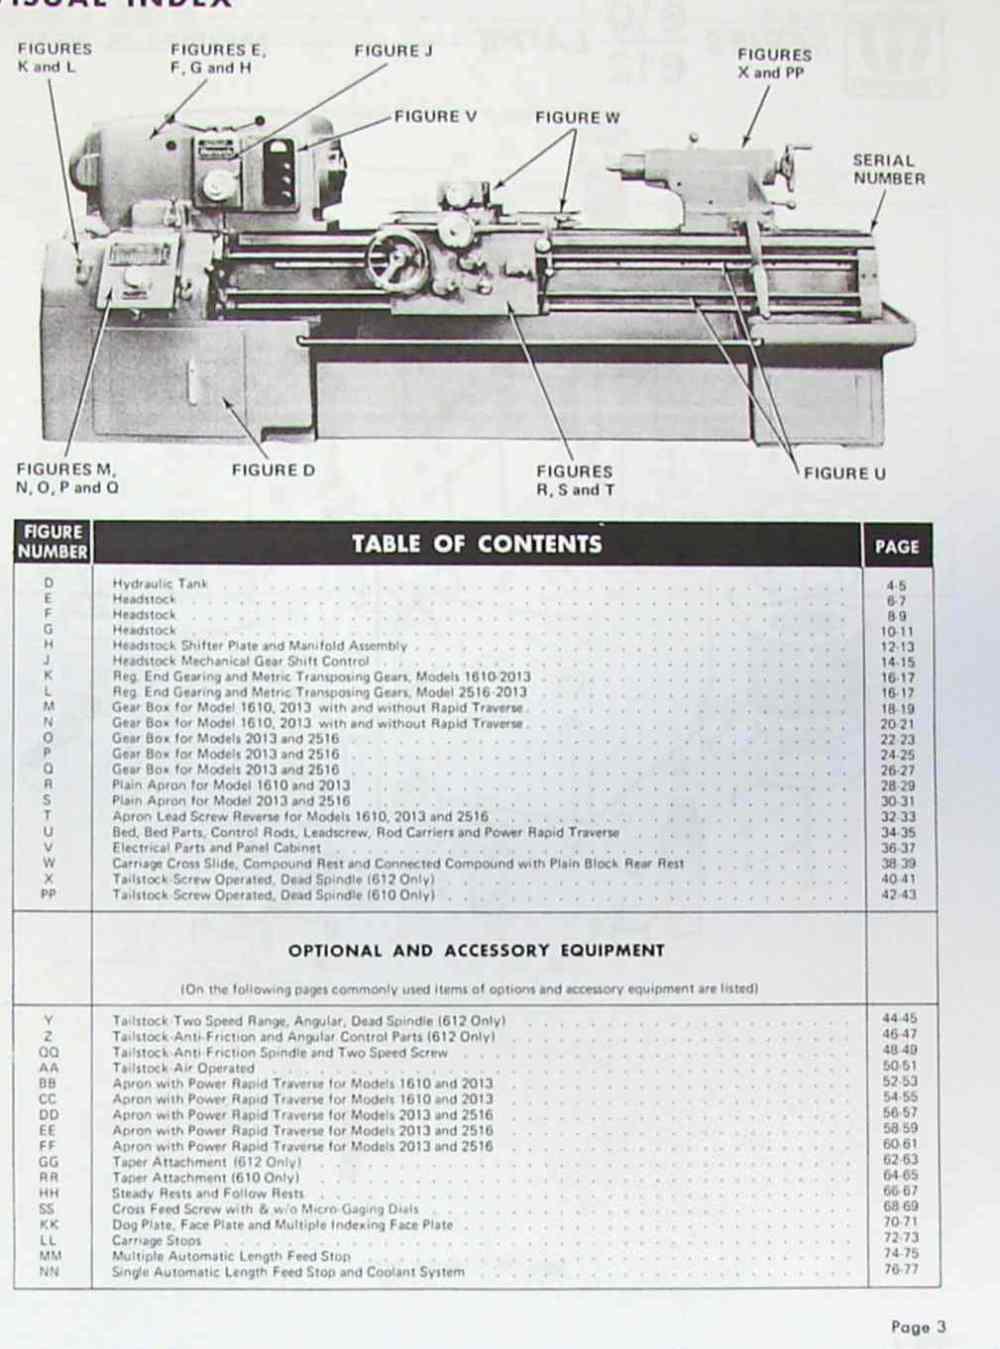 medium resolution of monarch 610 612 metal lathe parts manual ozark tool manuals books rh ozarktoolmanuals com engine lathe parts diagram engine lathe parts diagram